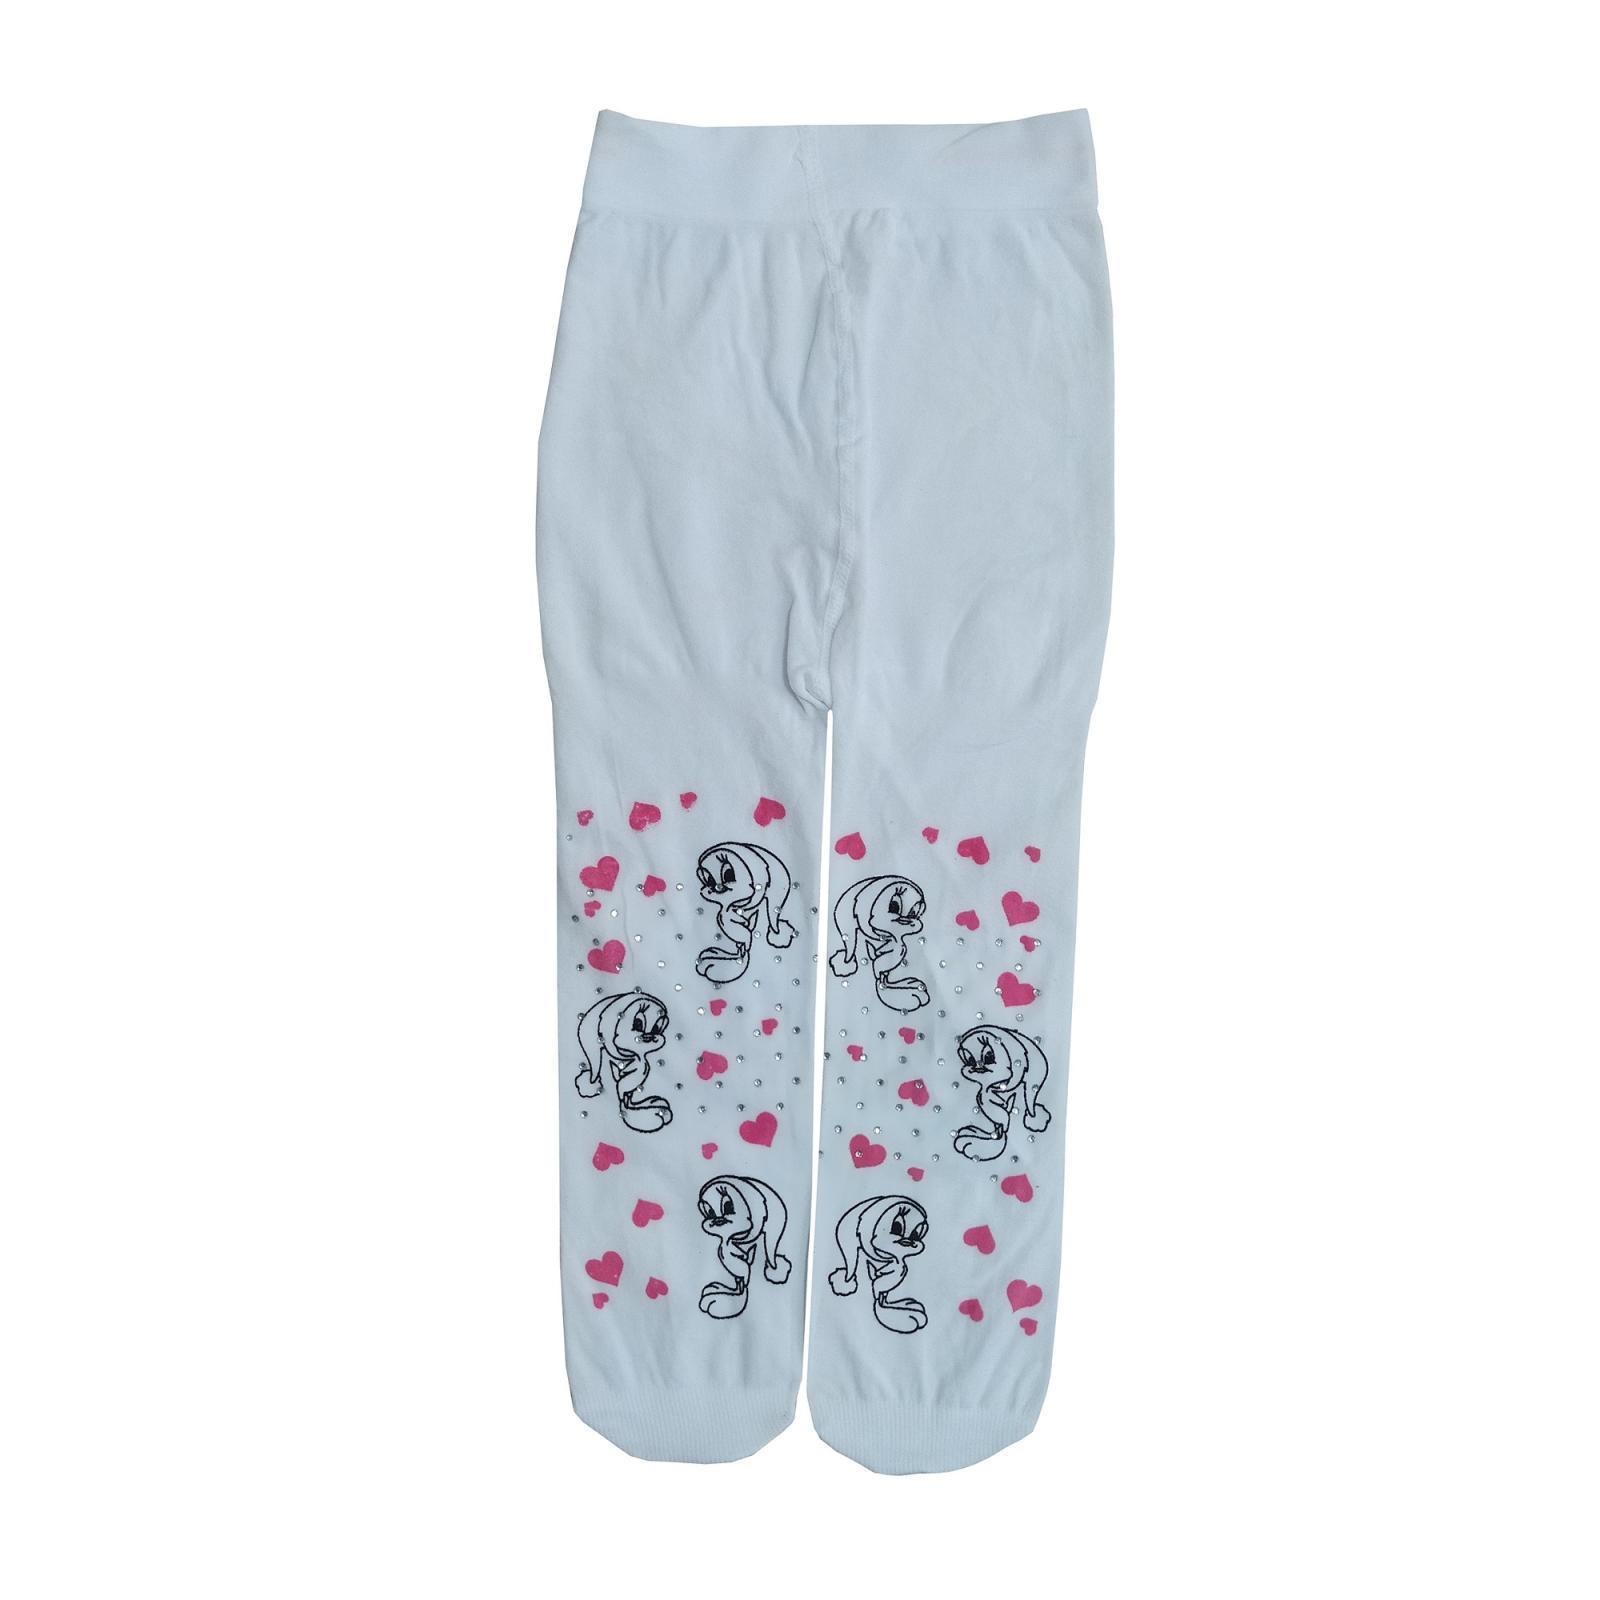 جوراب شلواری نوزادی دخترانه کد J99-03